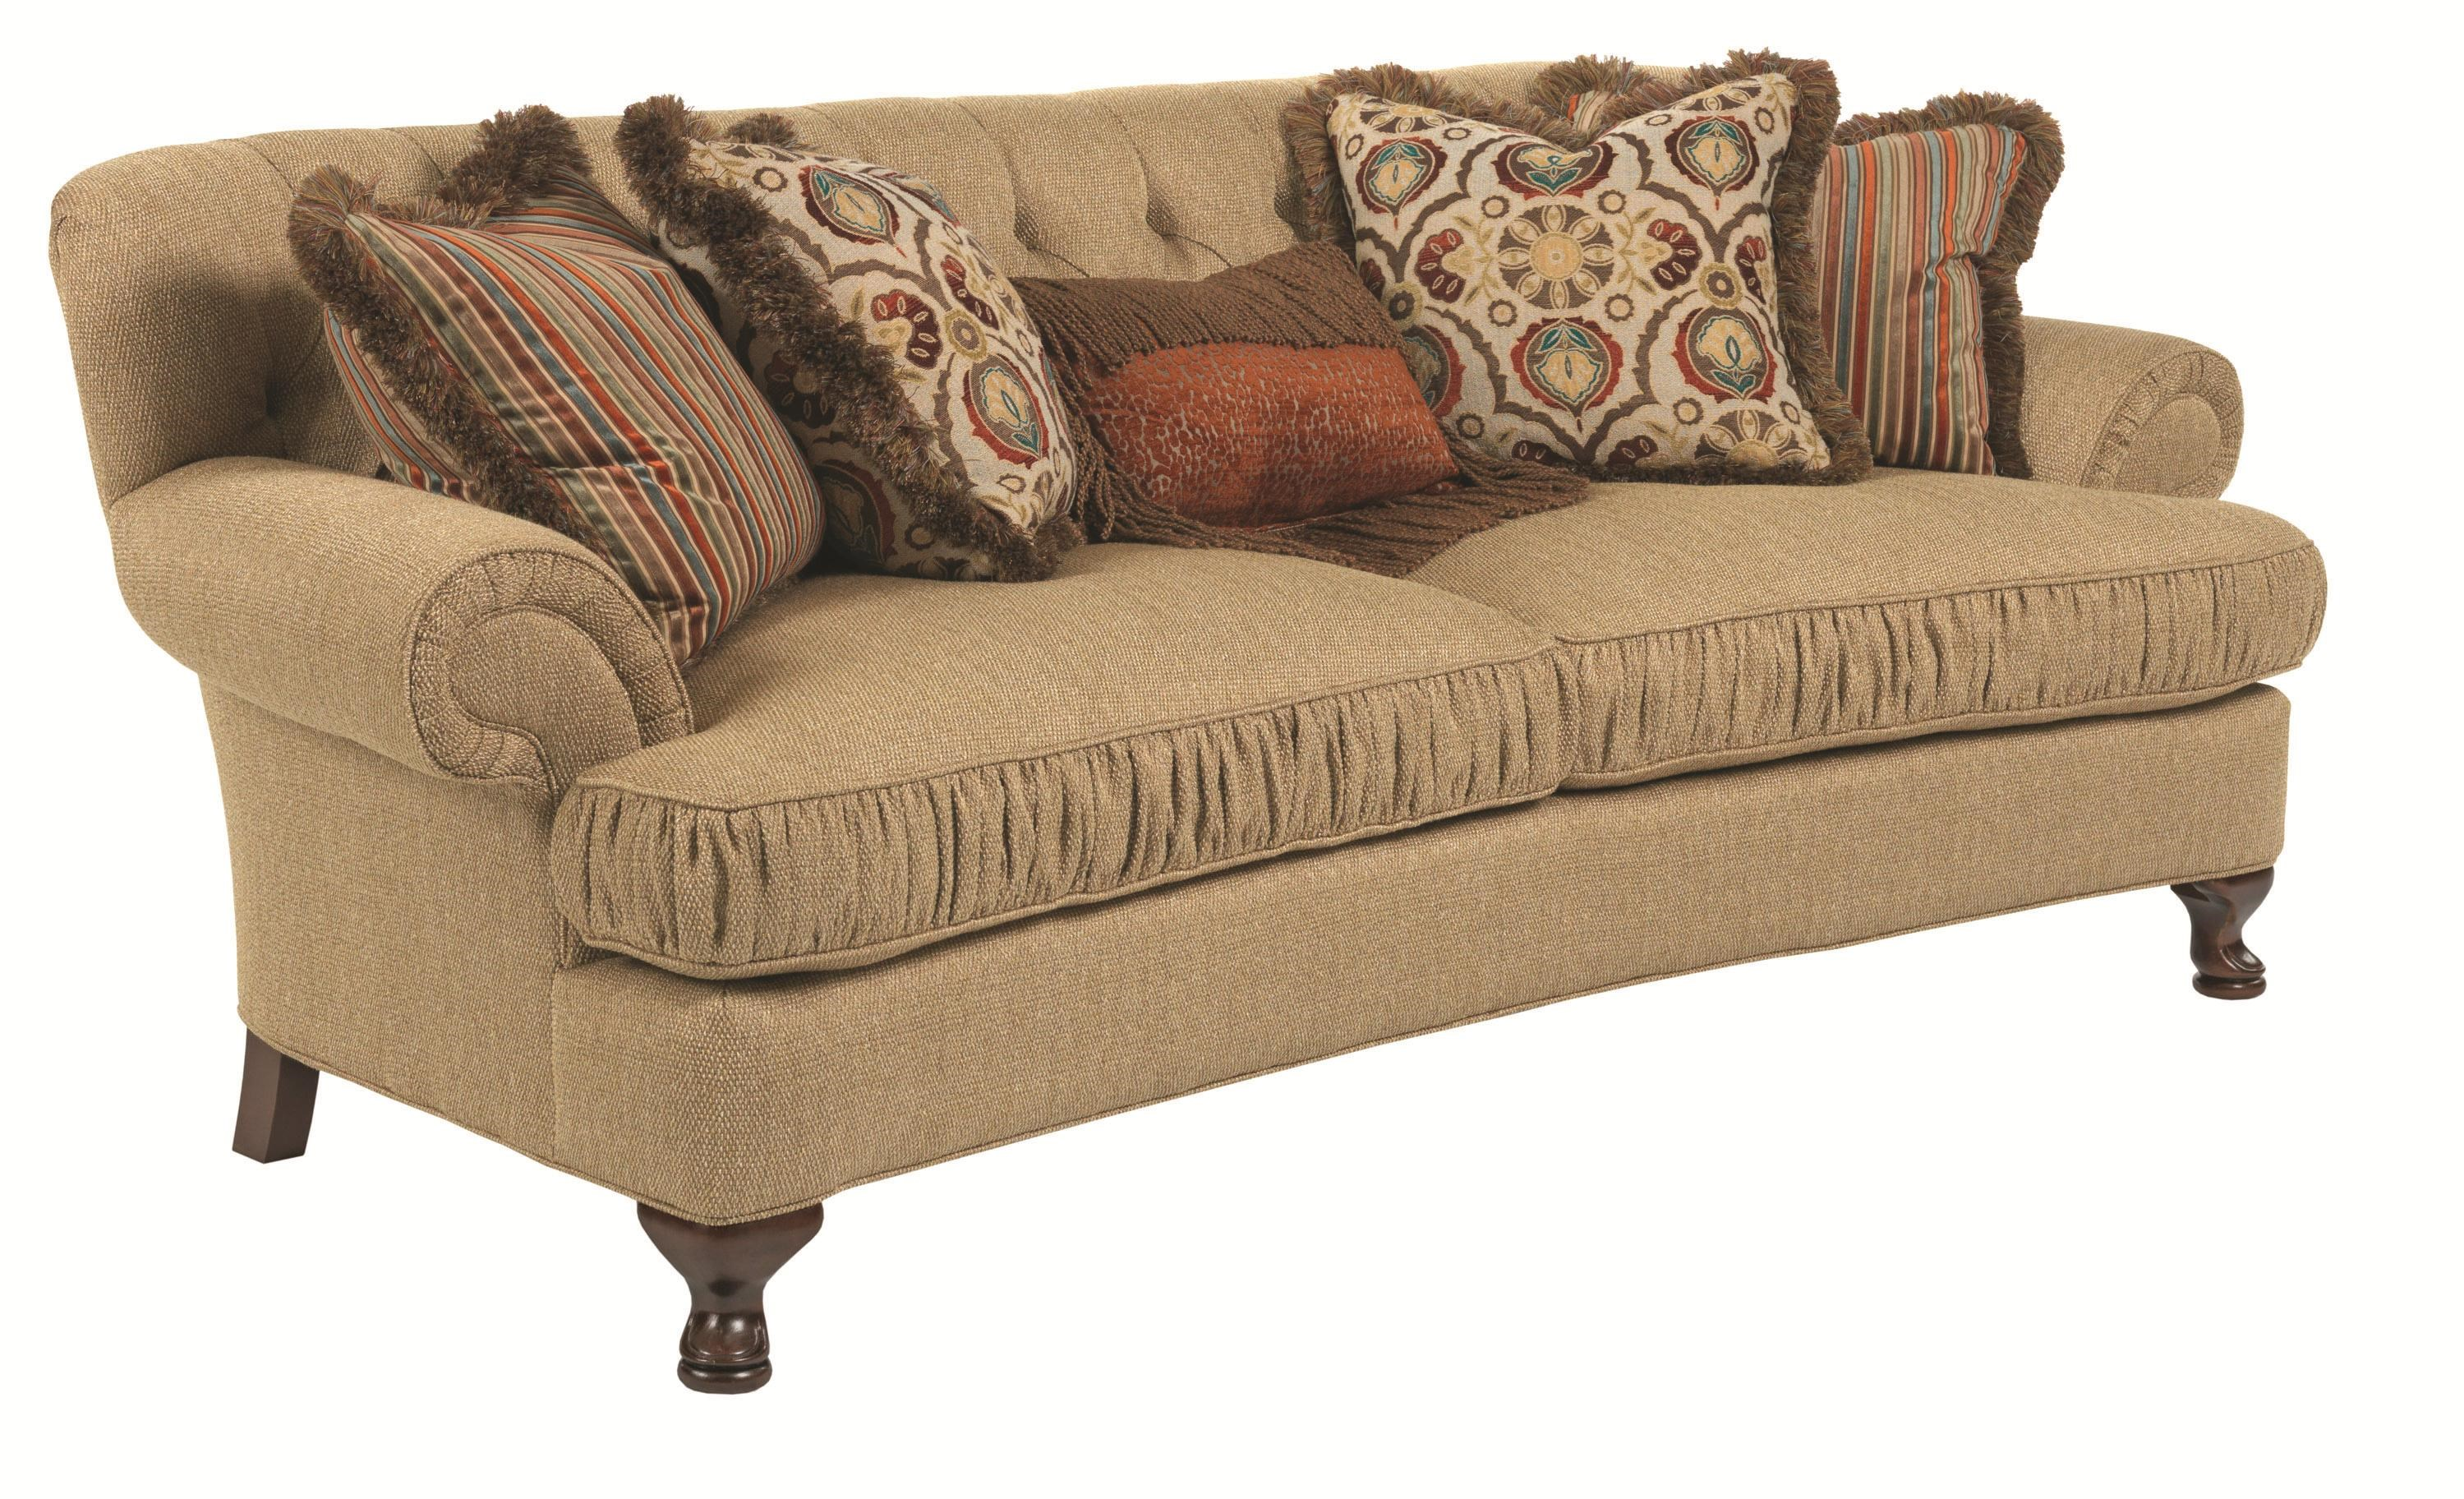 conversational sofa cover latest corner design 2017 kincaid sofas furniture living room simone